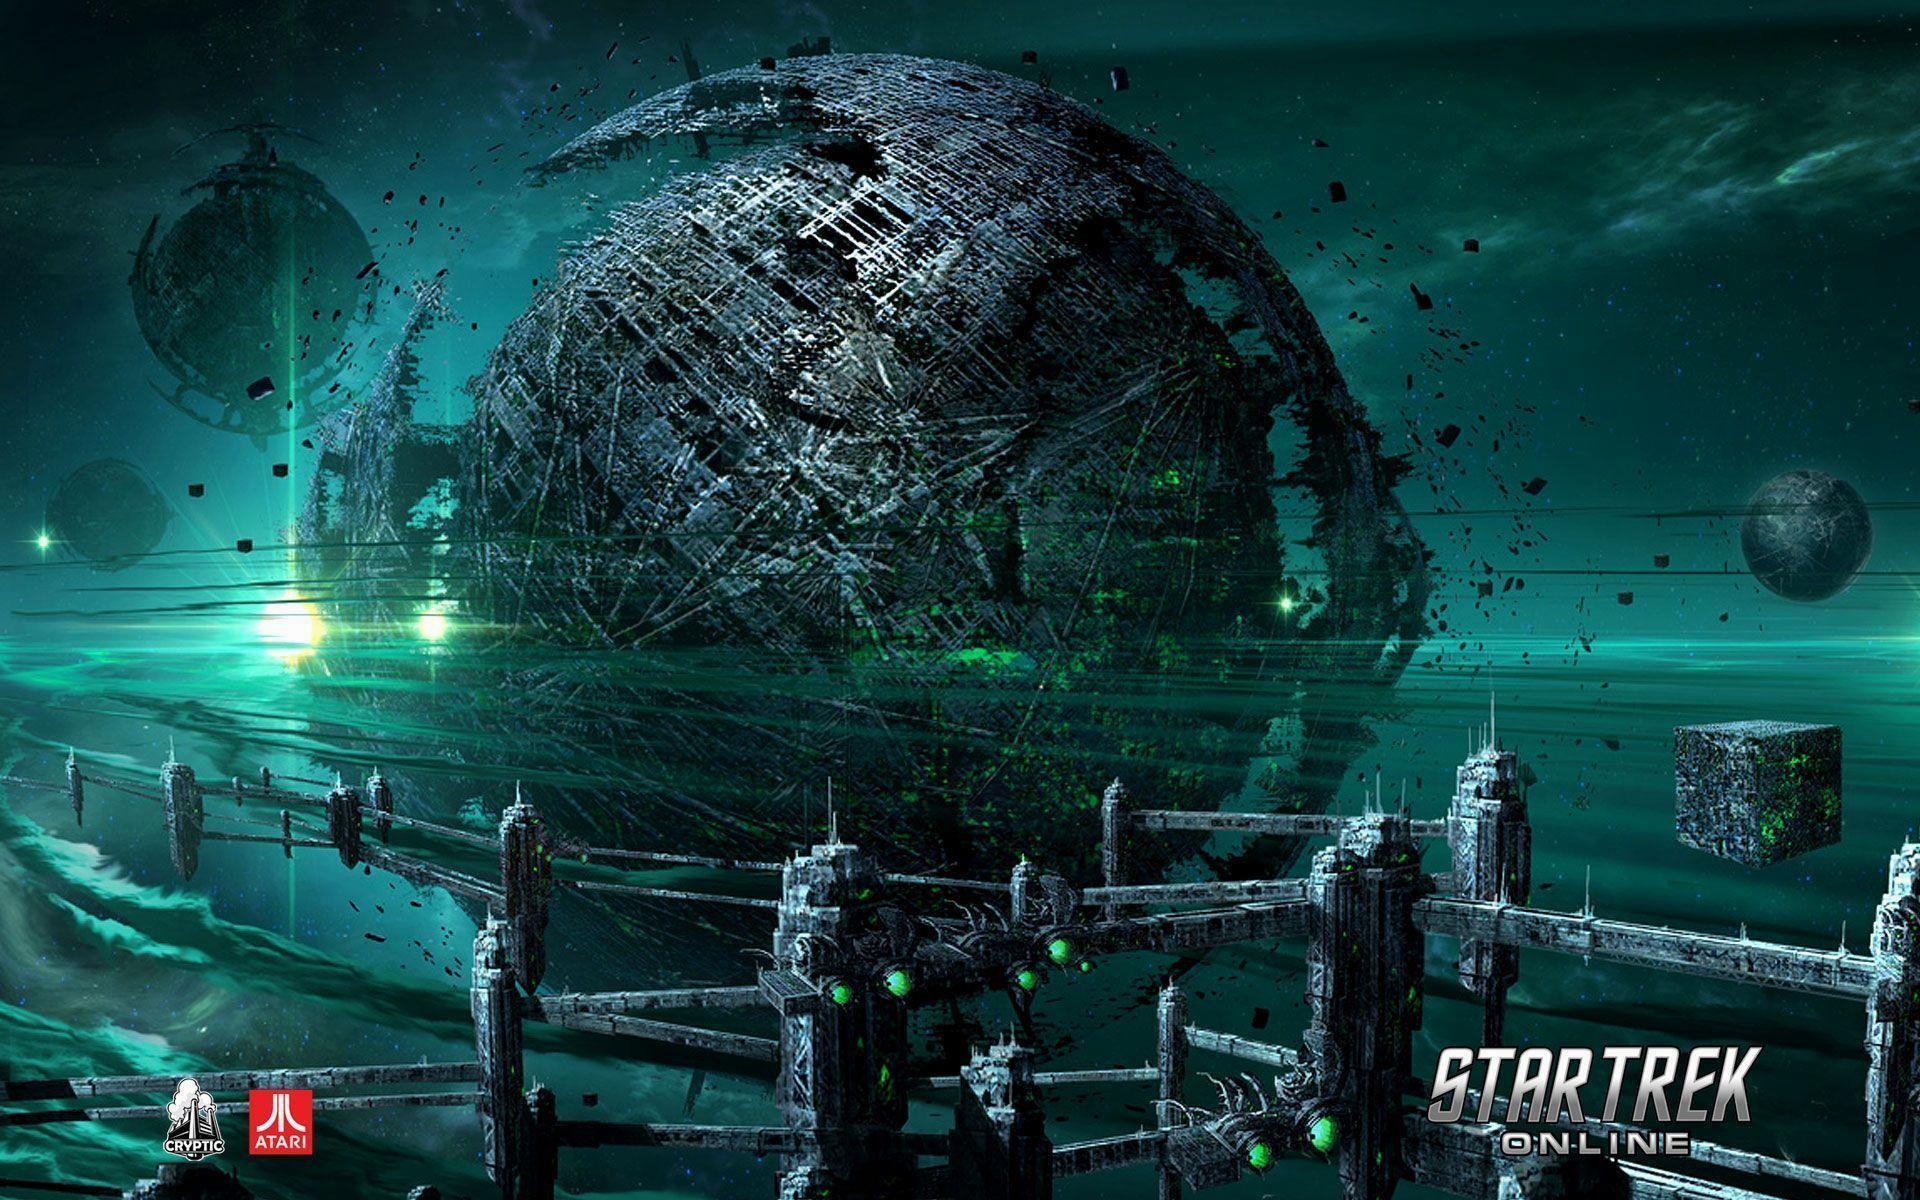 wallpaper.wiki-Borg-Star-Trek-Wallpaper-Widescreen-PIC-